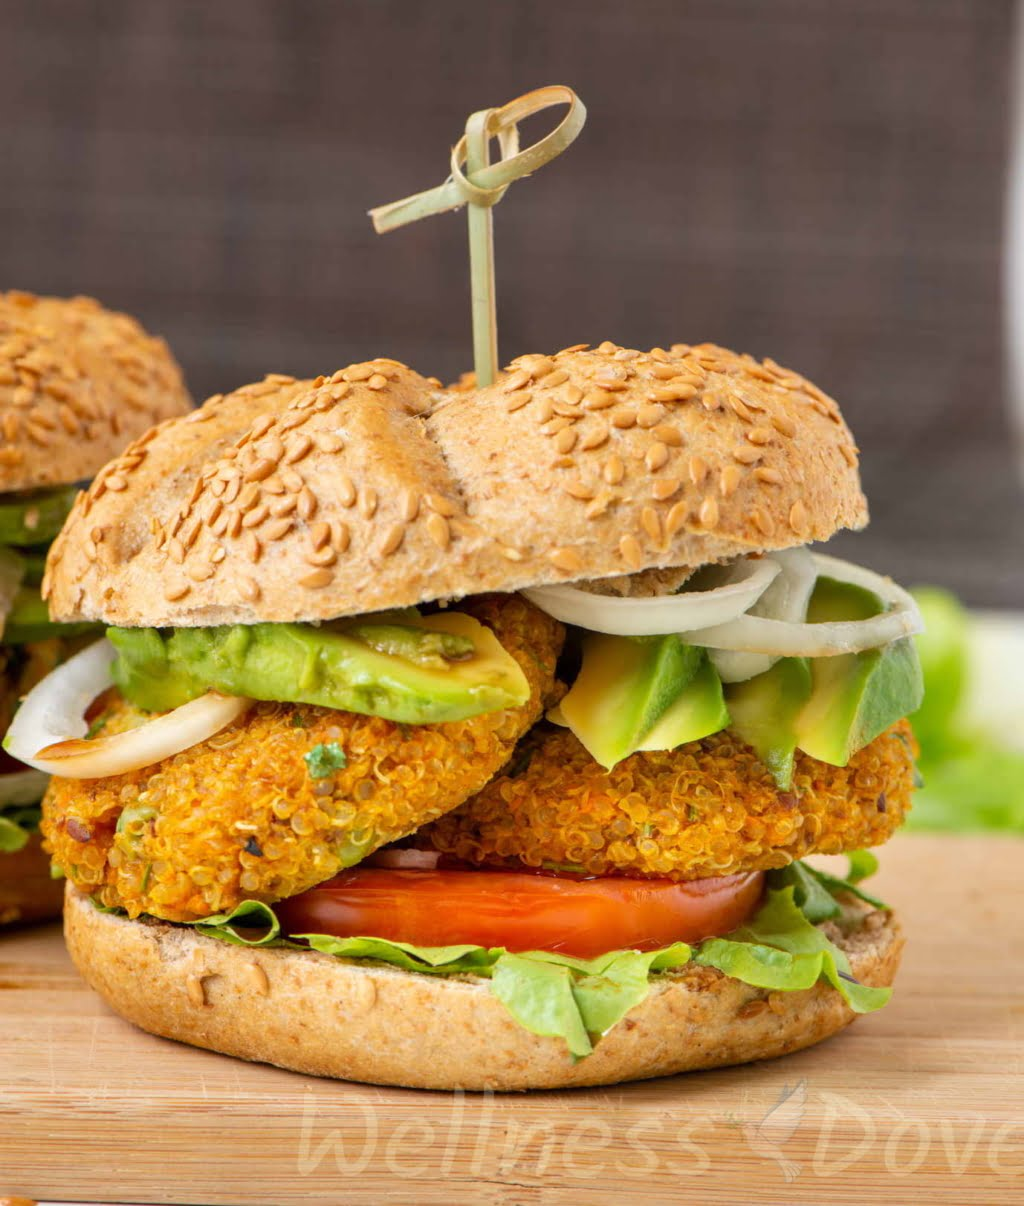 a vegan quinoa burger on a wooden chopping board